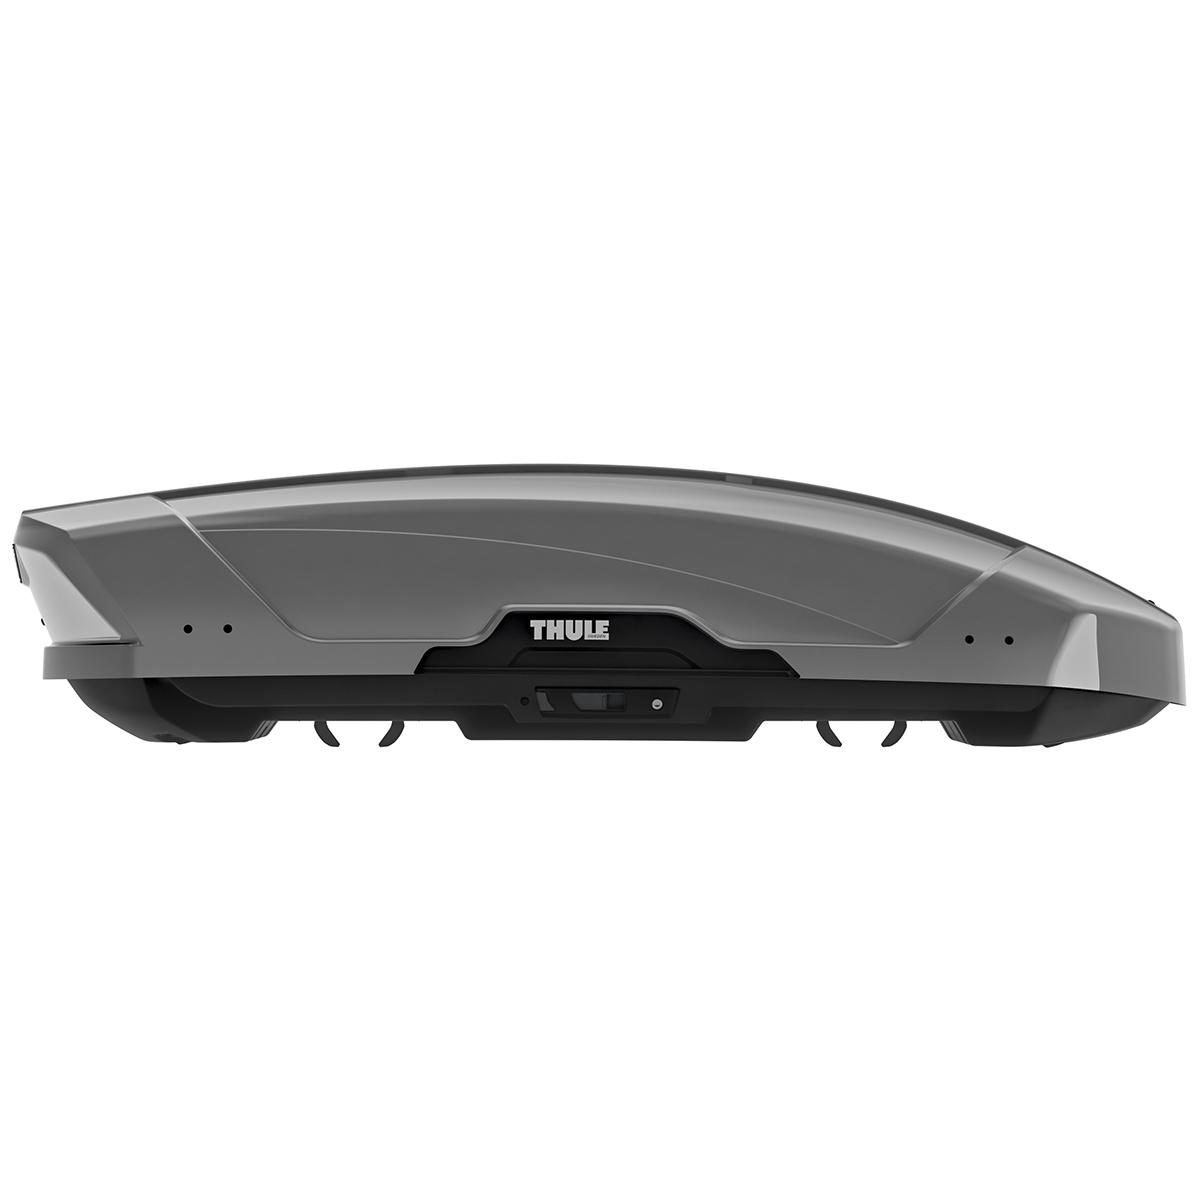 Thule Motion XT M 200 6292T (Titan Glossy) Roof Box